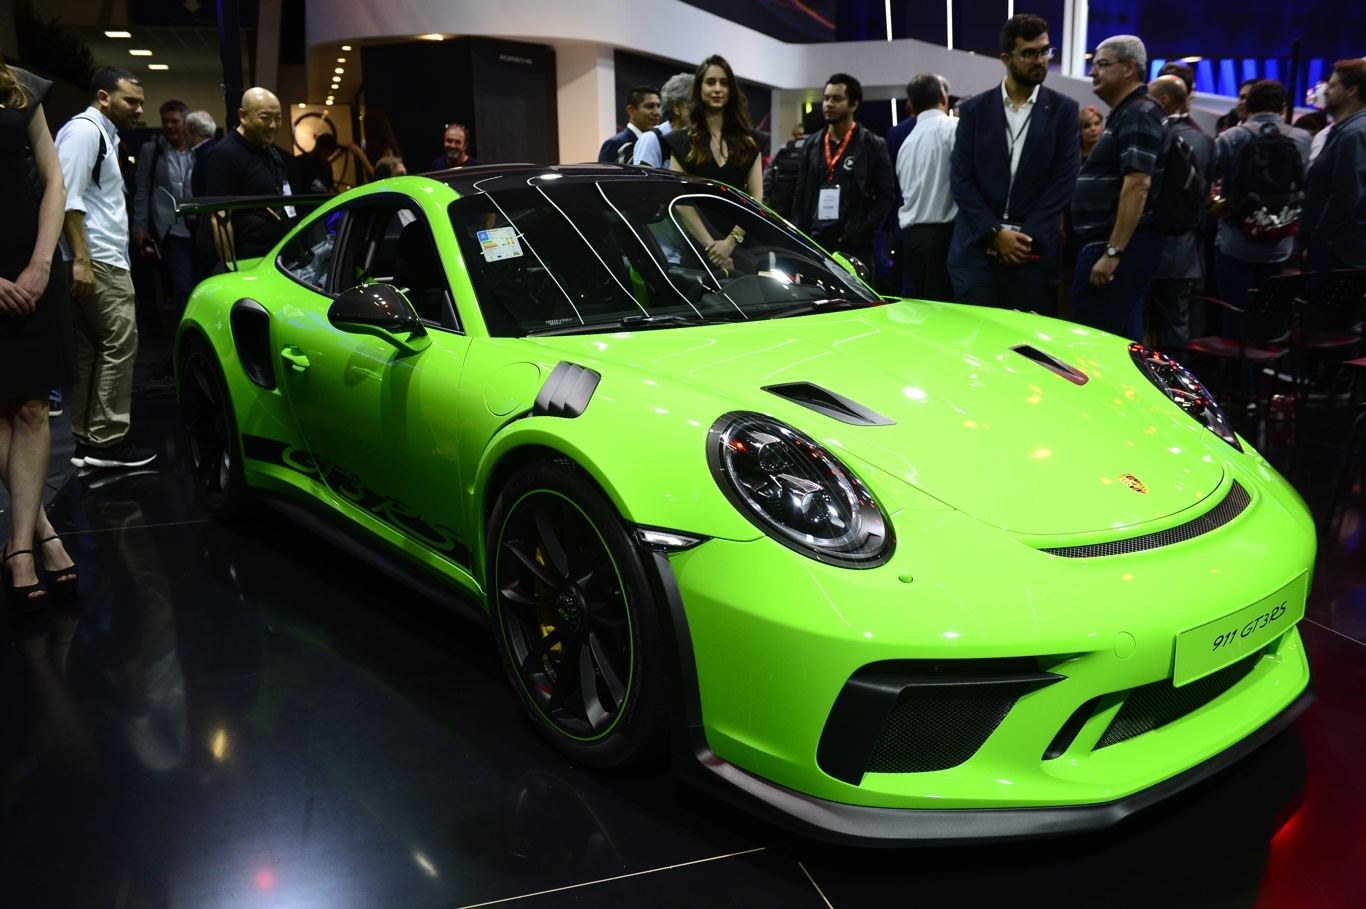 Porsche Mostra Superesportivo Gt3 Rs E Novo Suv Macan No Brasil Quatro Rodas